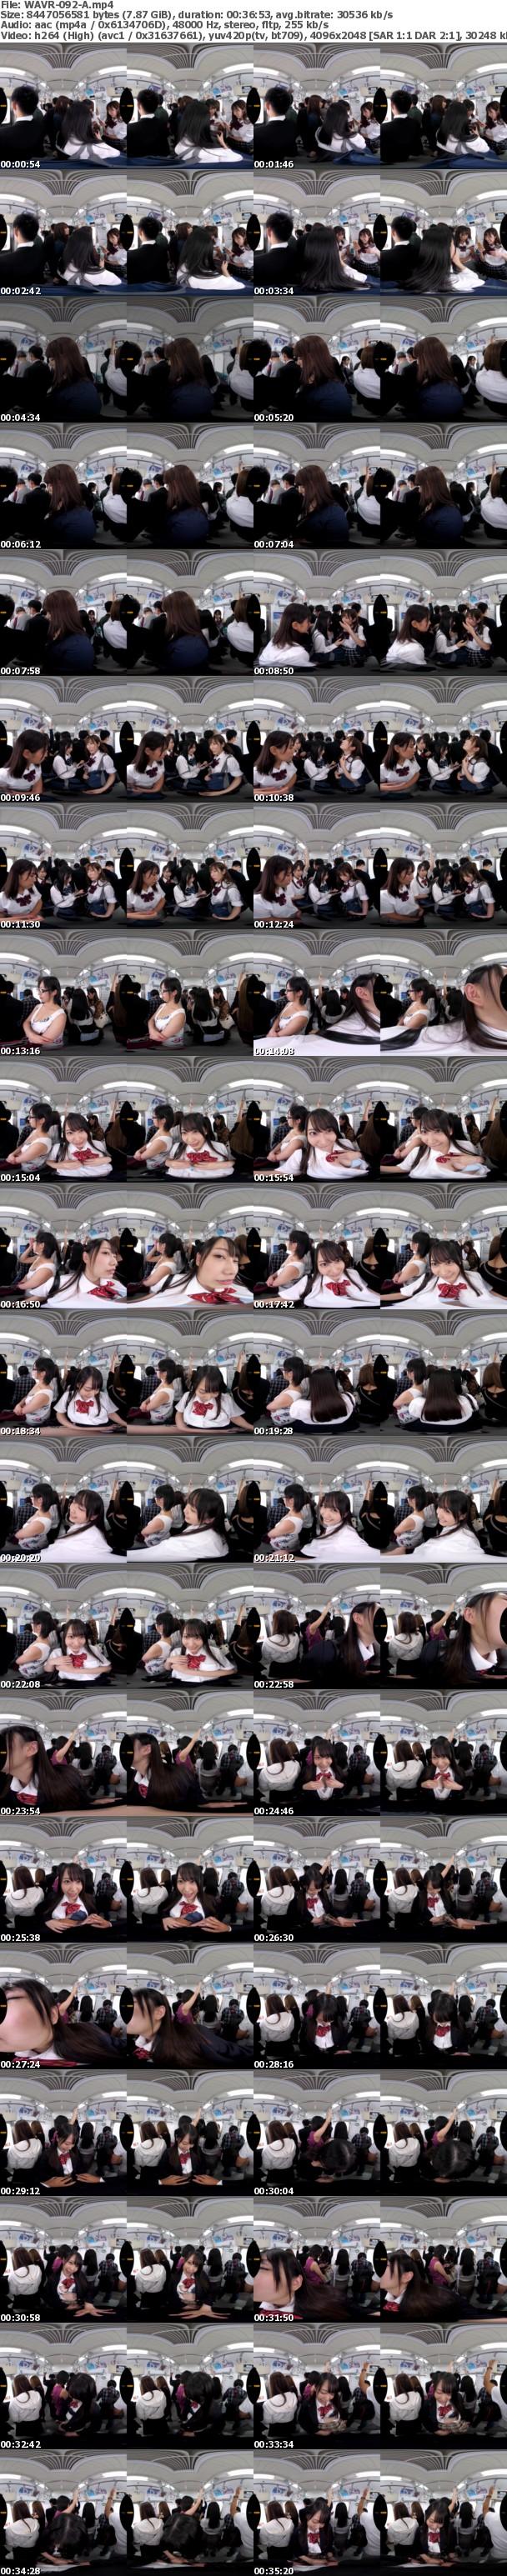 (VR) WAVR-092 満員電車で突然キス誘惑される逆痴● 弥生みづき